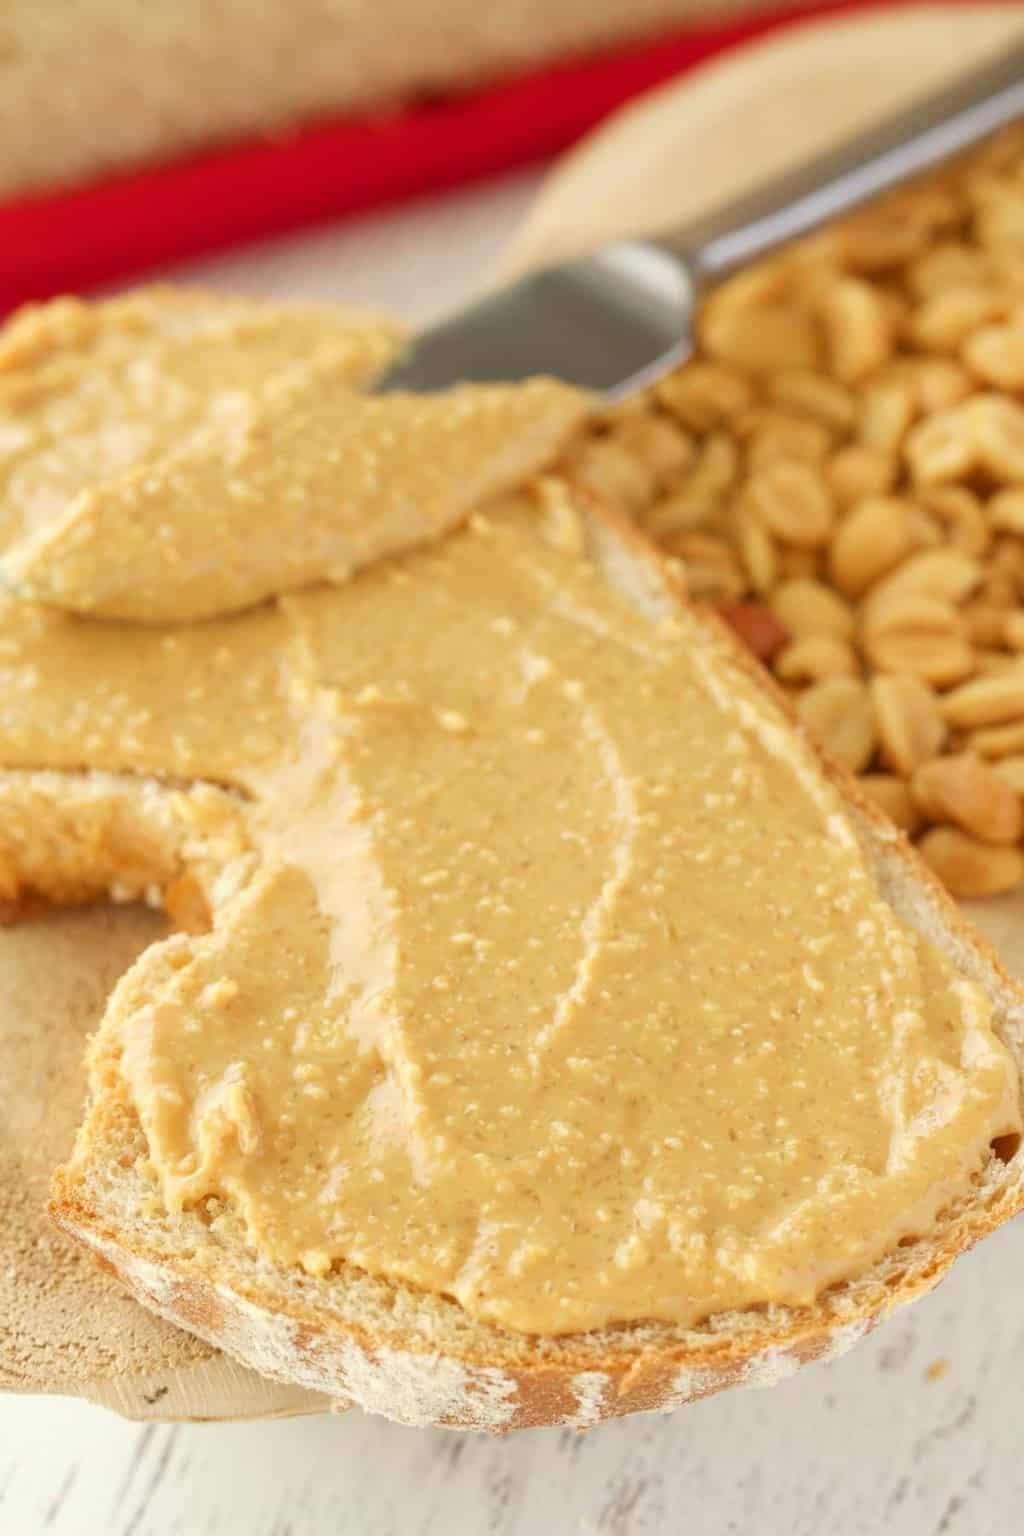 Homemade Peanut Butter Loving It Vegan